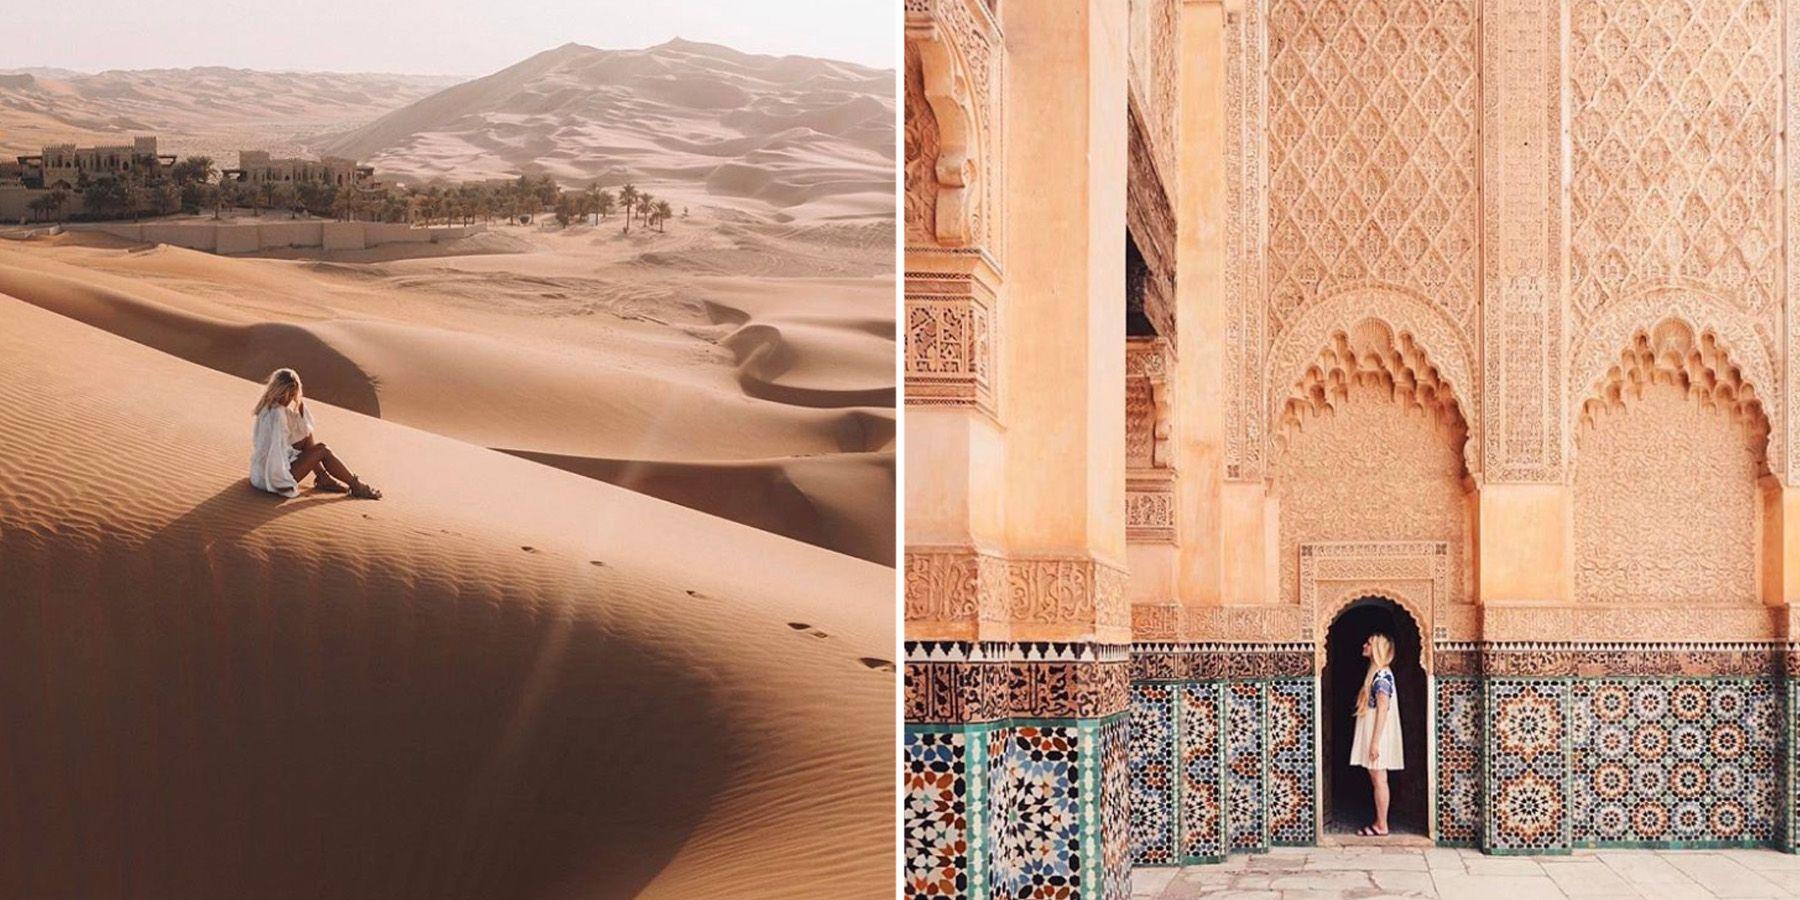 Ready, Set, Jet: 20 Travel Accounts to Follow on Instagram